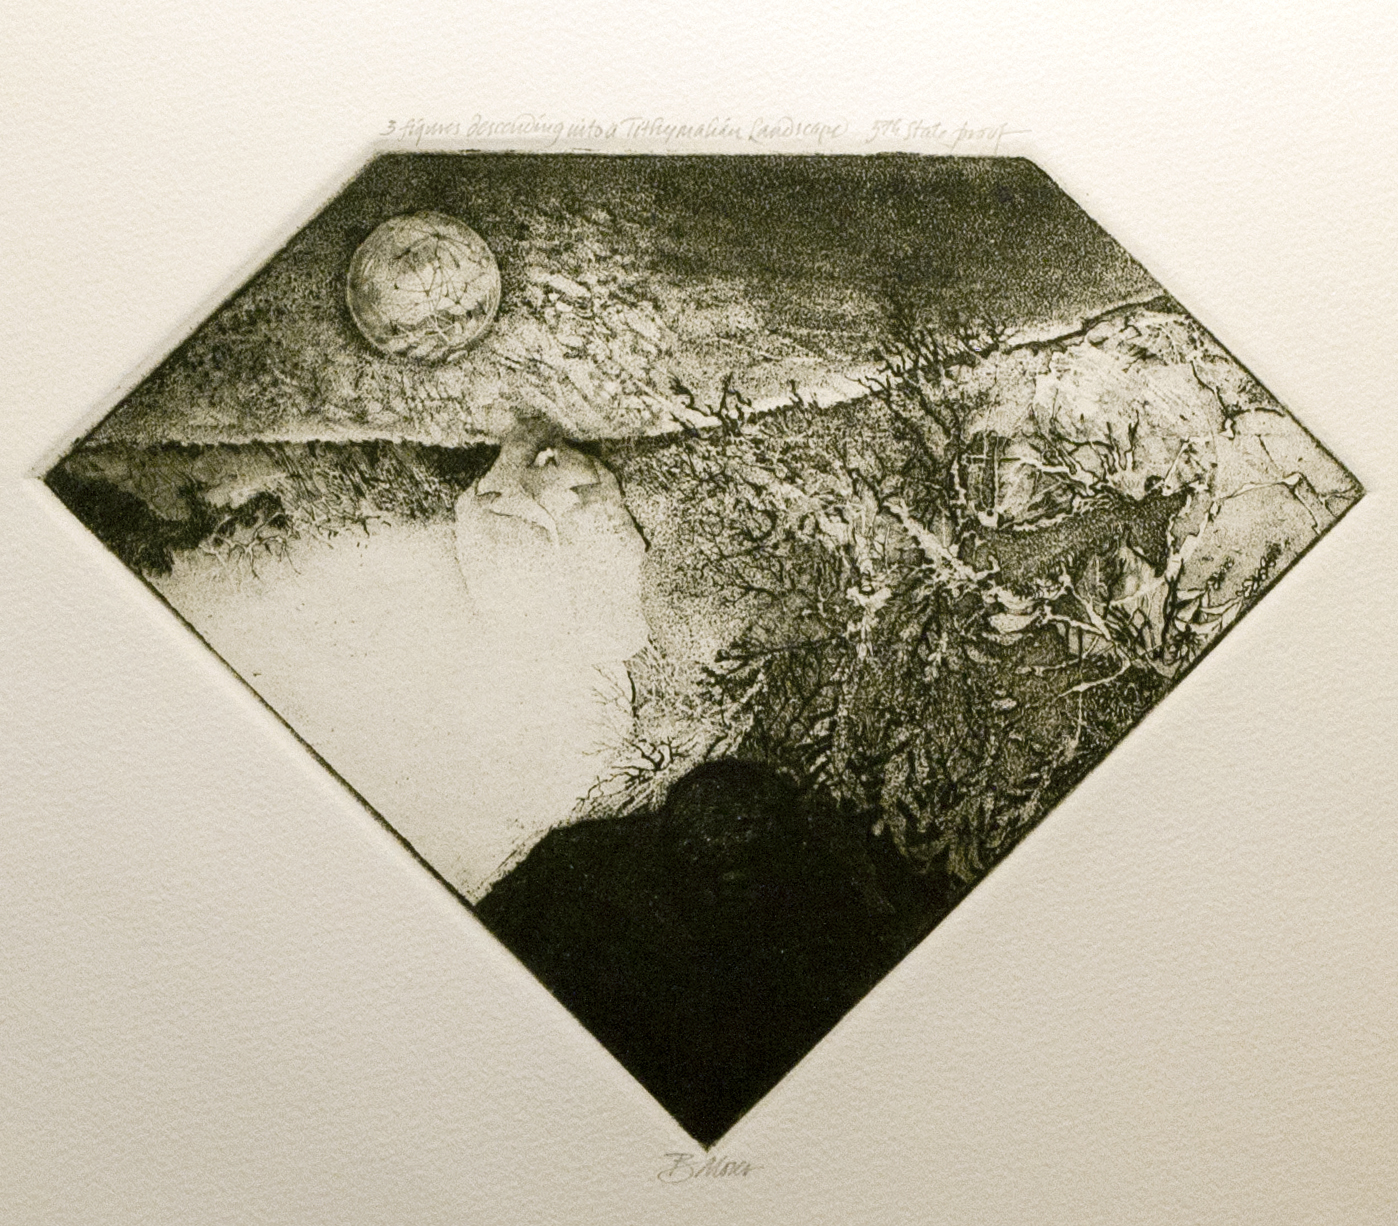 Two Figures Descending Into a Tithymalian Landscape